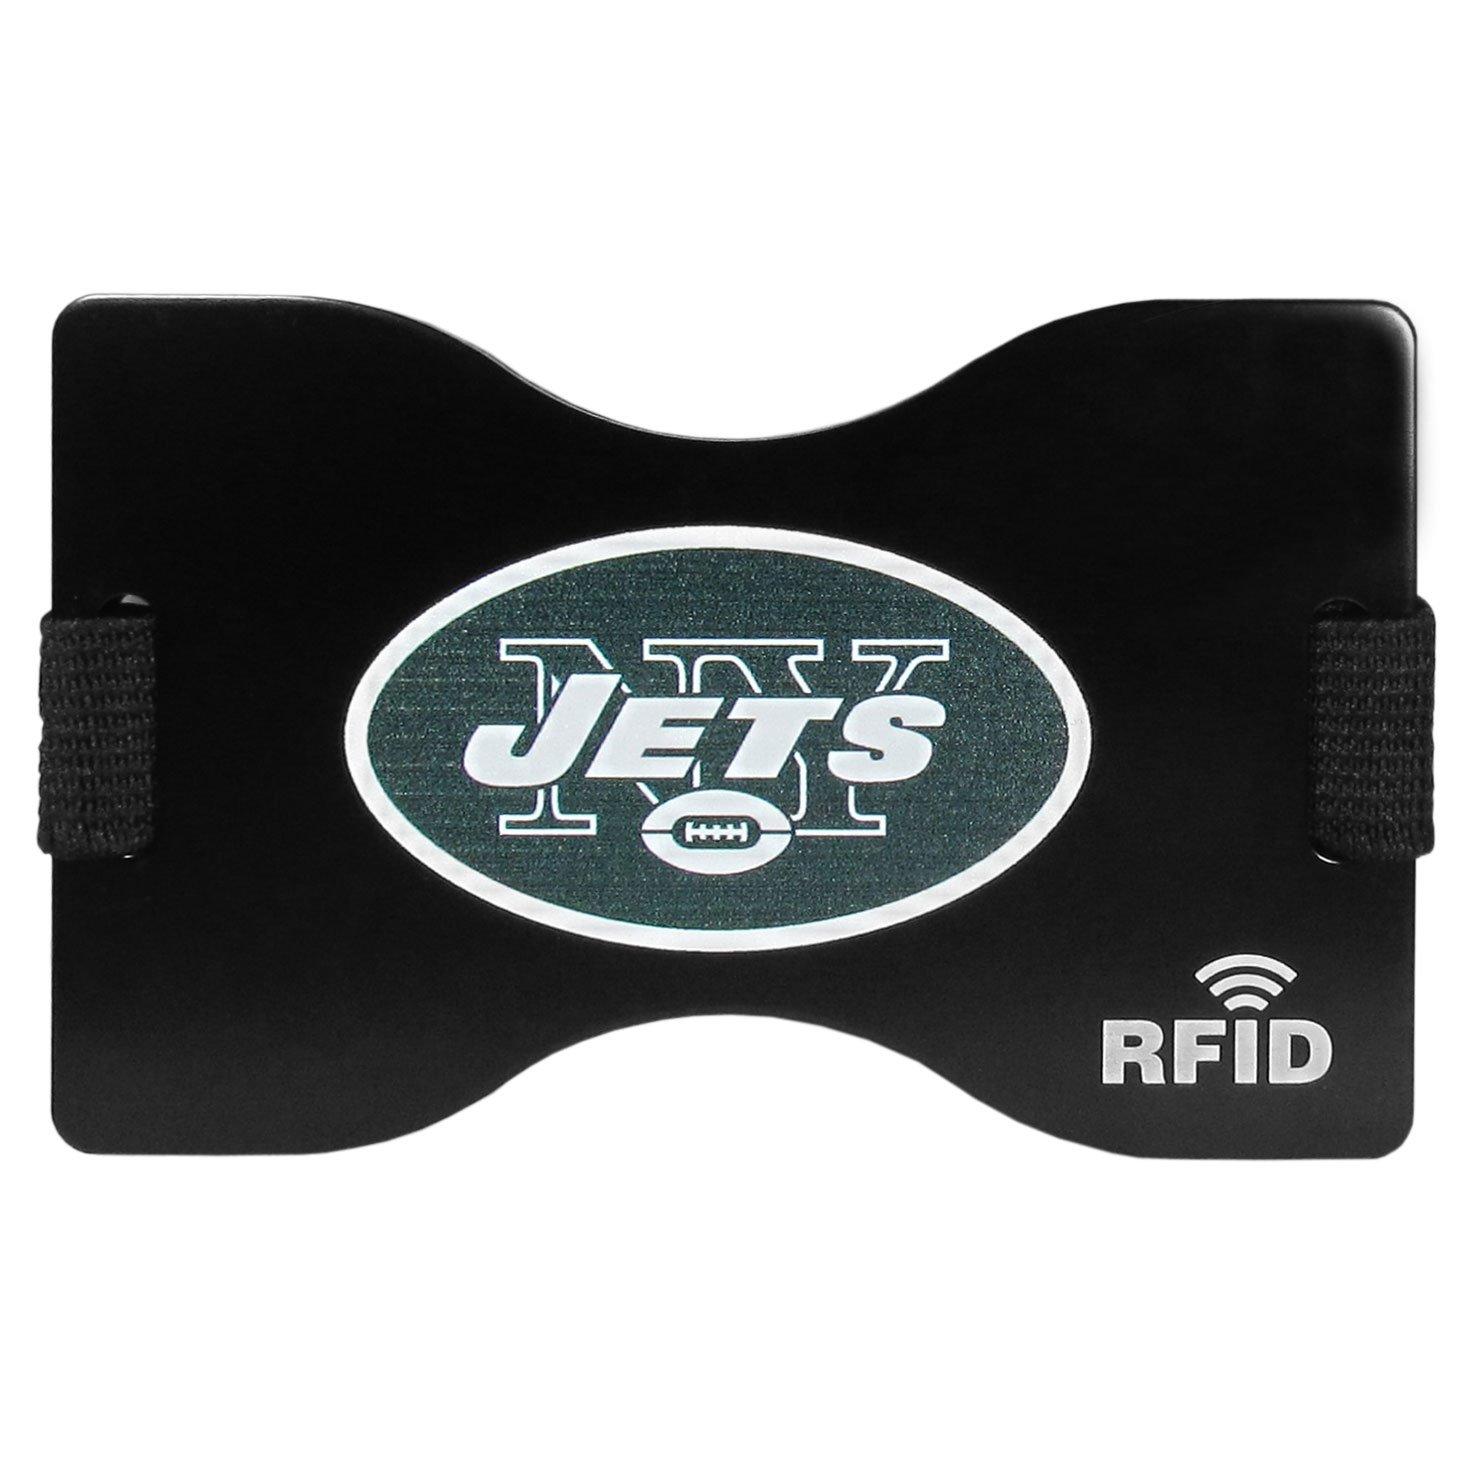 Siskiyou NFL Unisex RFID Wallet Black One Size Siskiyou Gifts Co Inc.